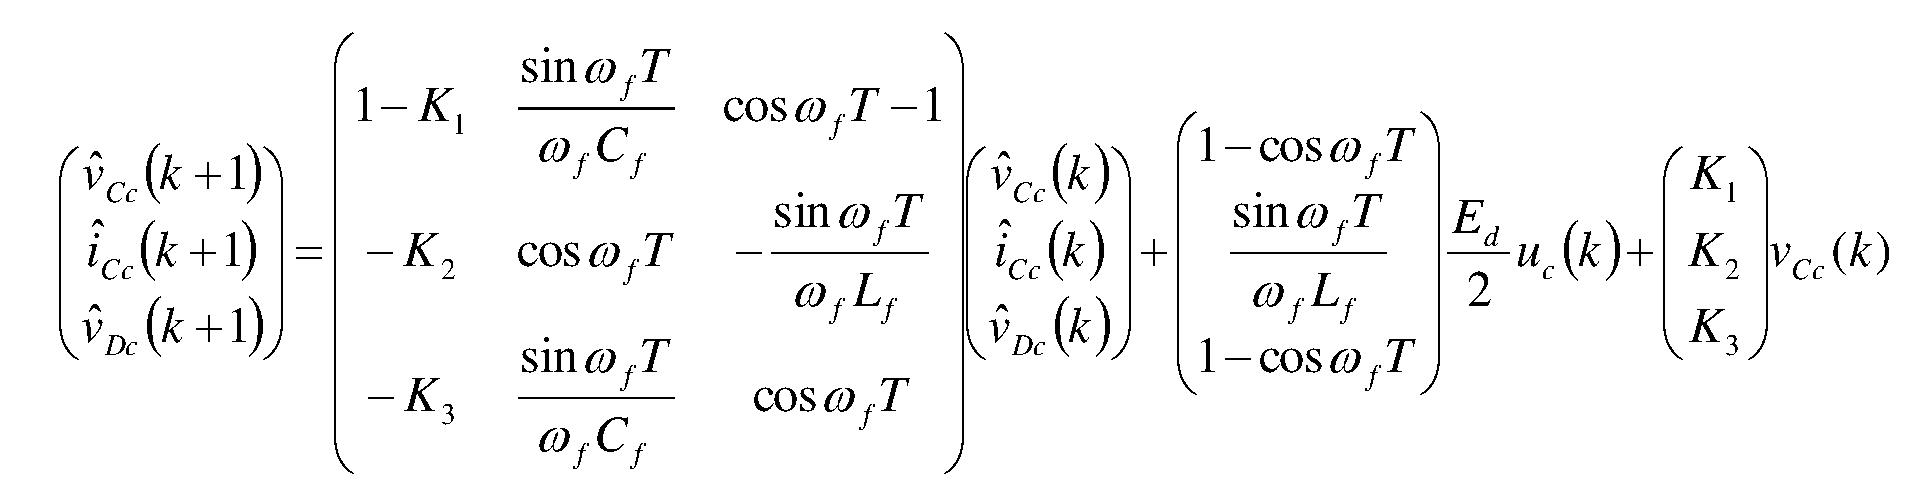 Figure TWI668458B_C0015